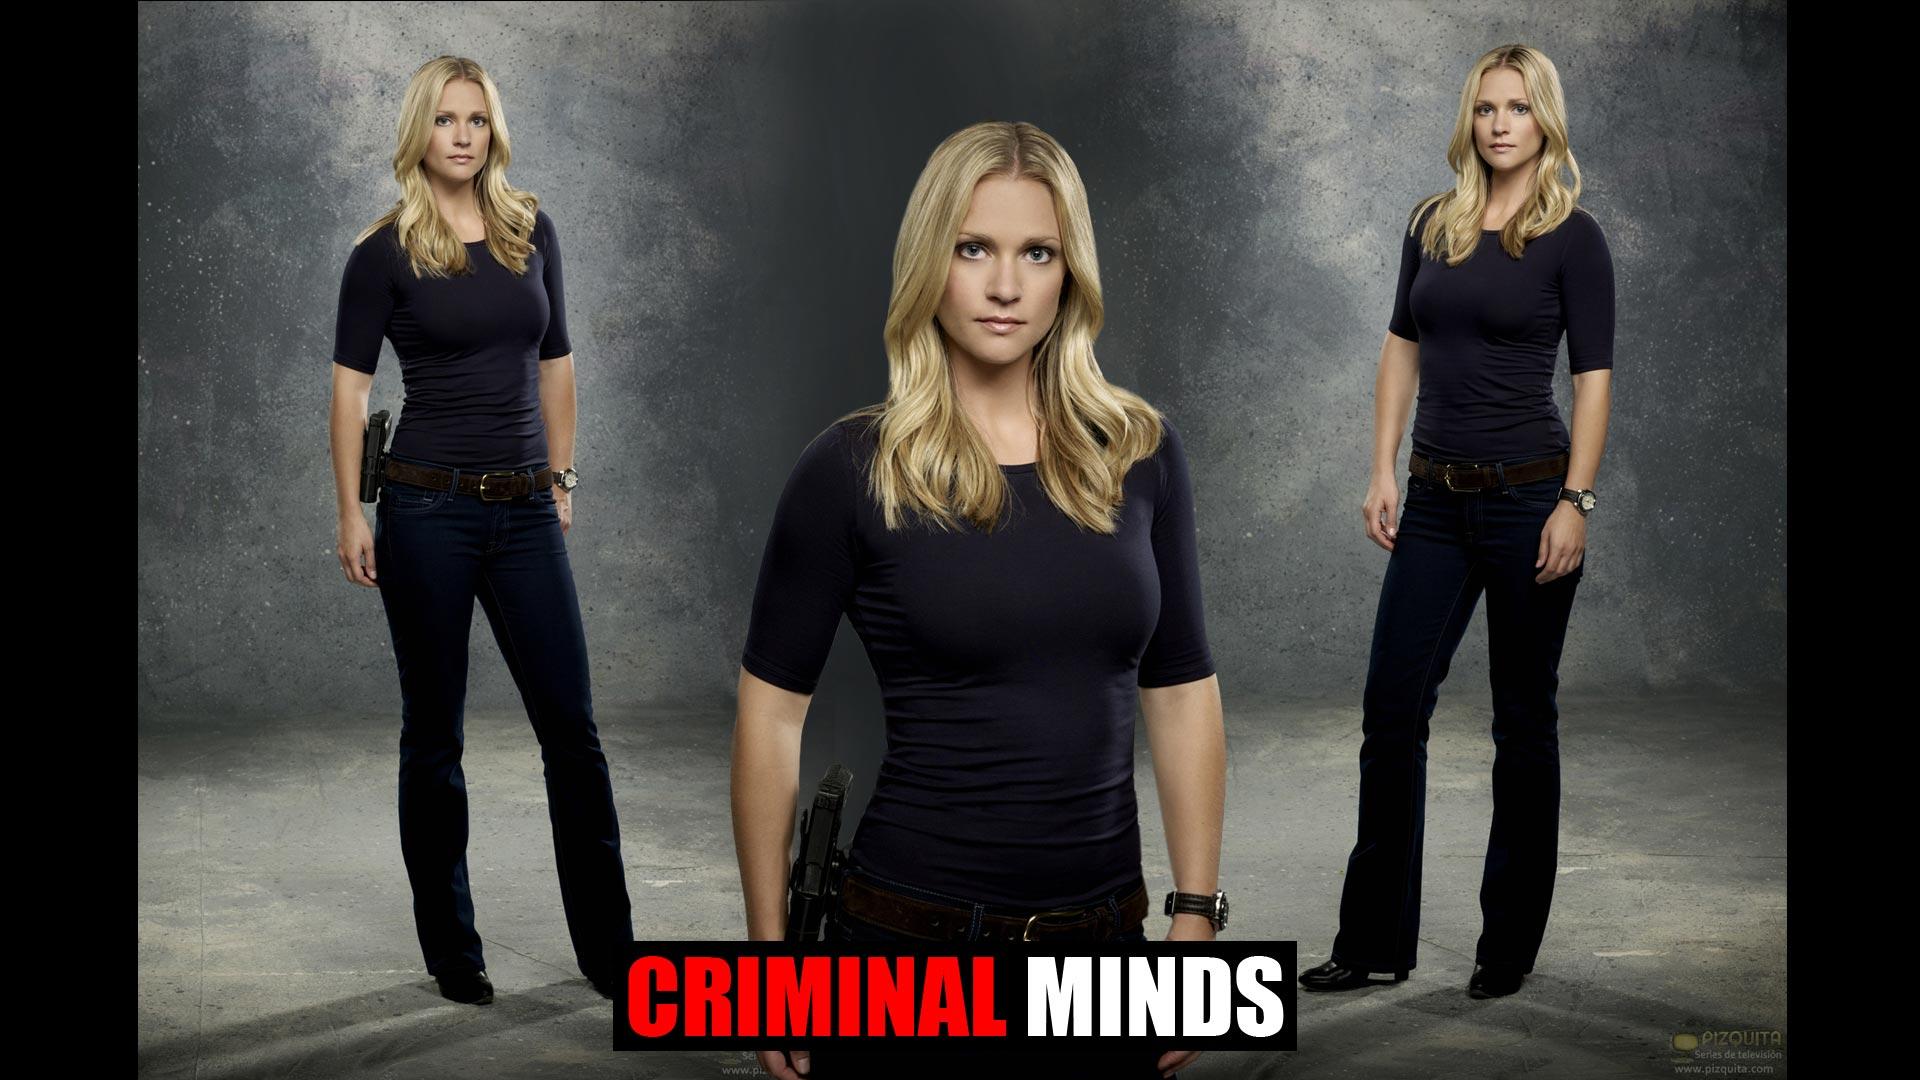 criminal minds jenifer jareau hd wallpaper hd wallpapers